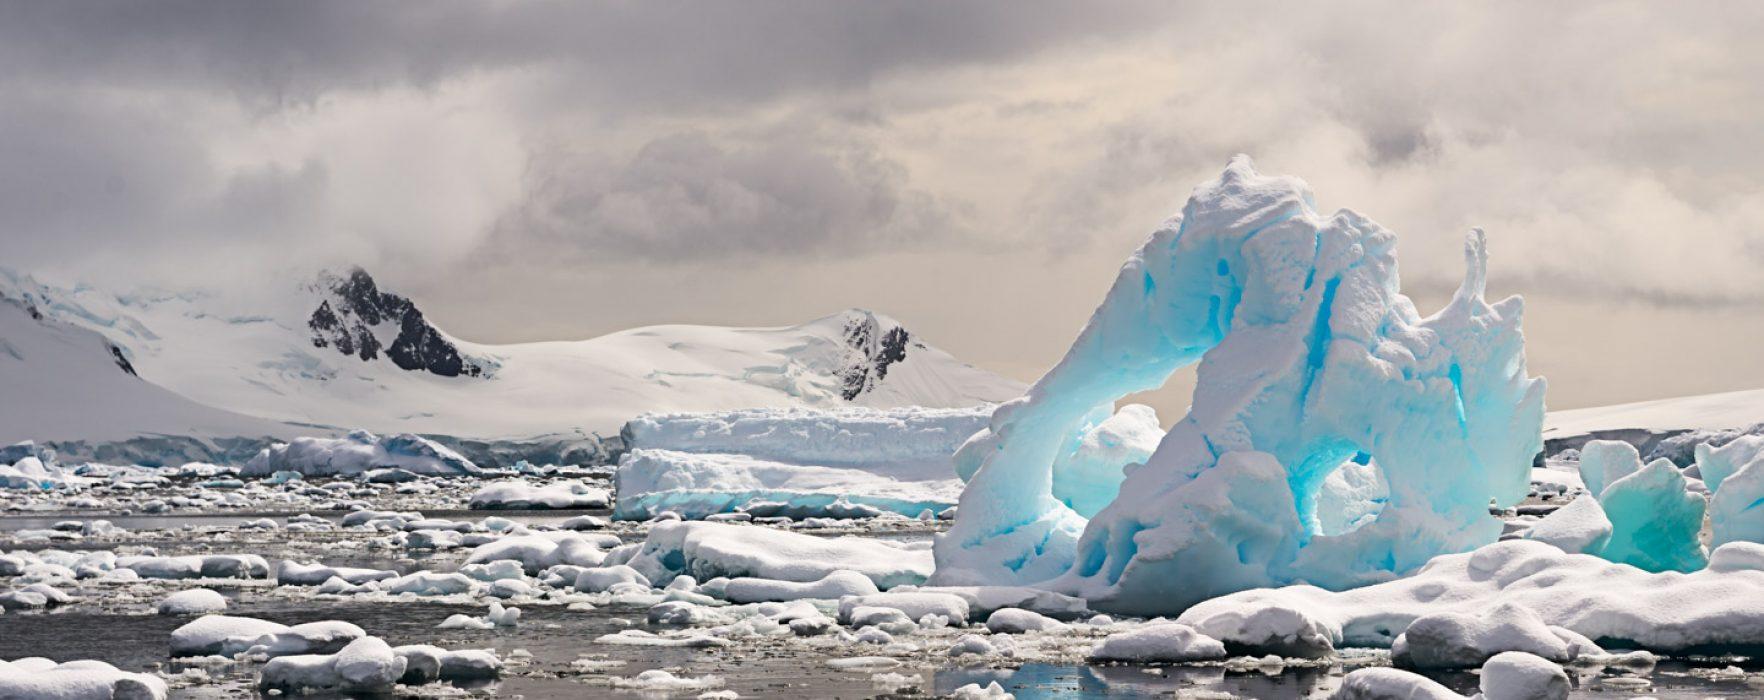 #688. Photographing Antarctica